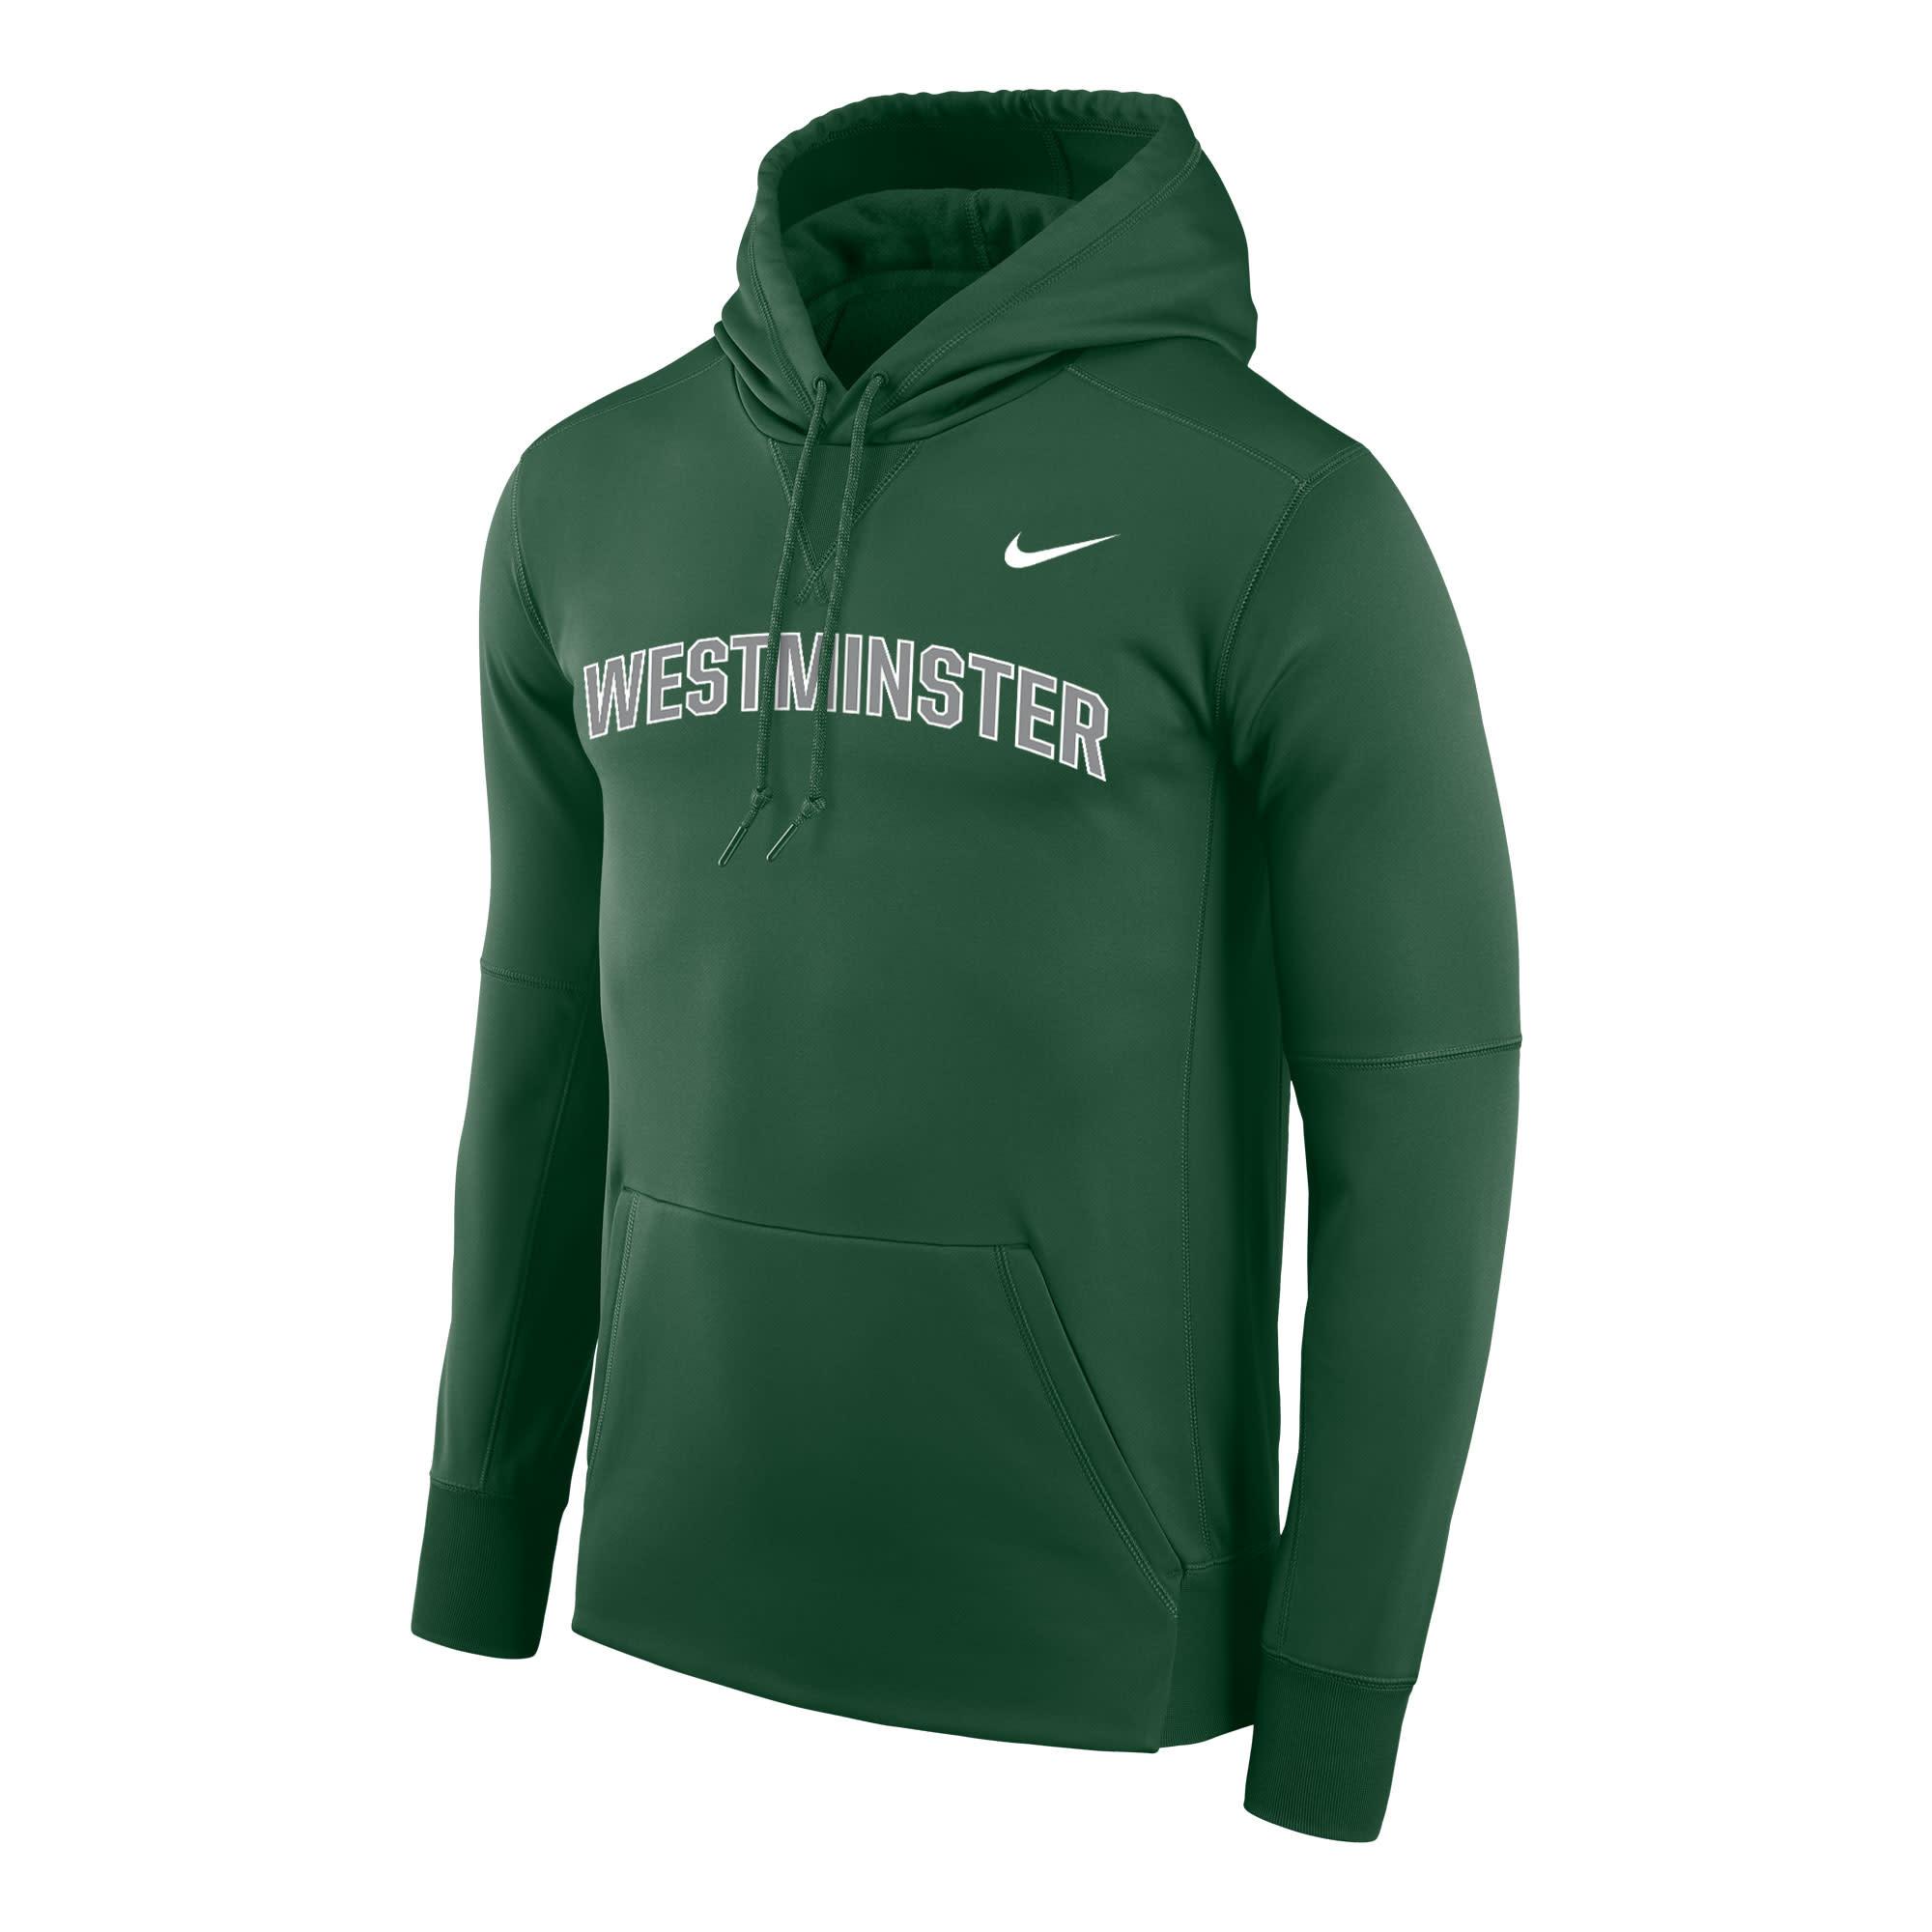 Nike Sweatshirt: Nike KO Pullover Hoody Green